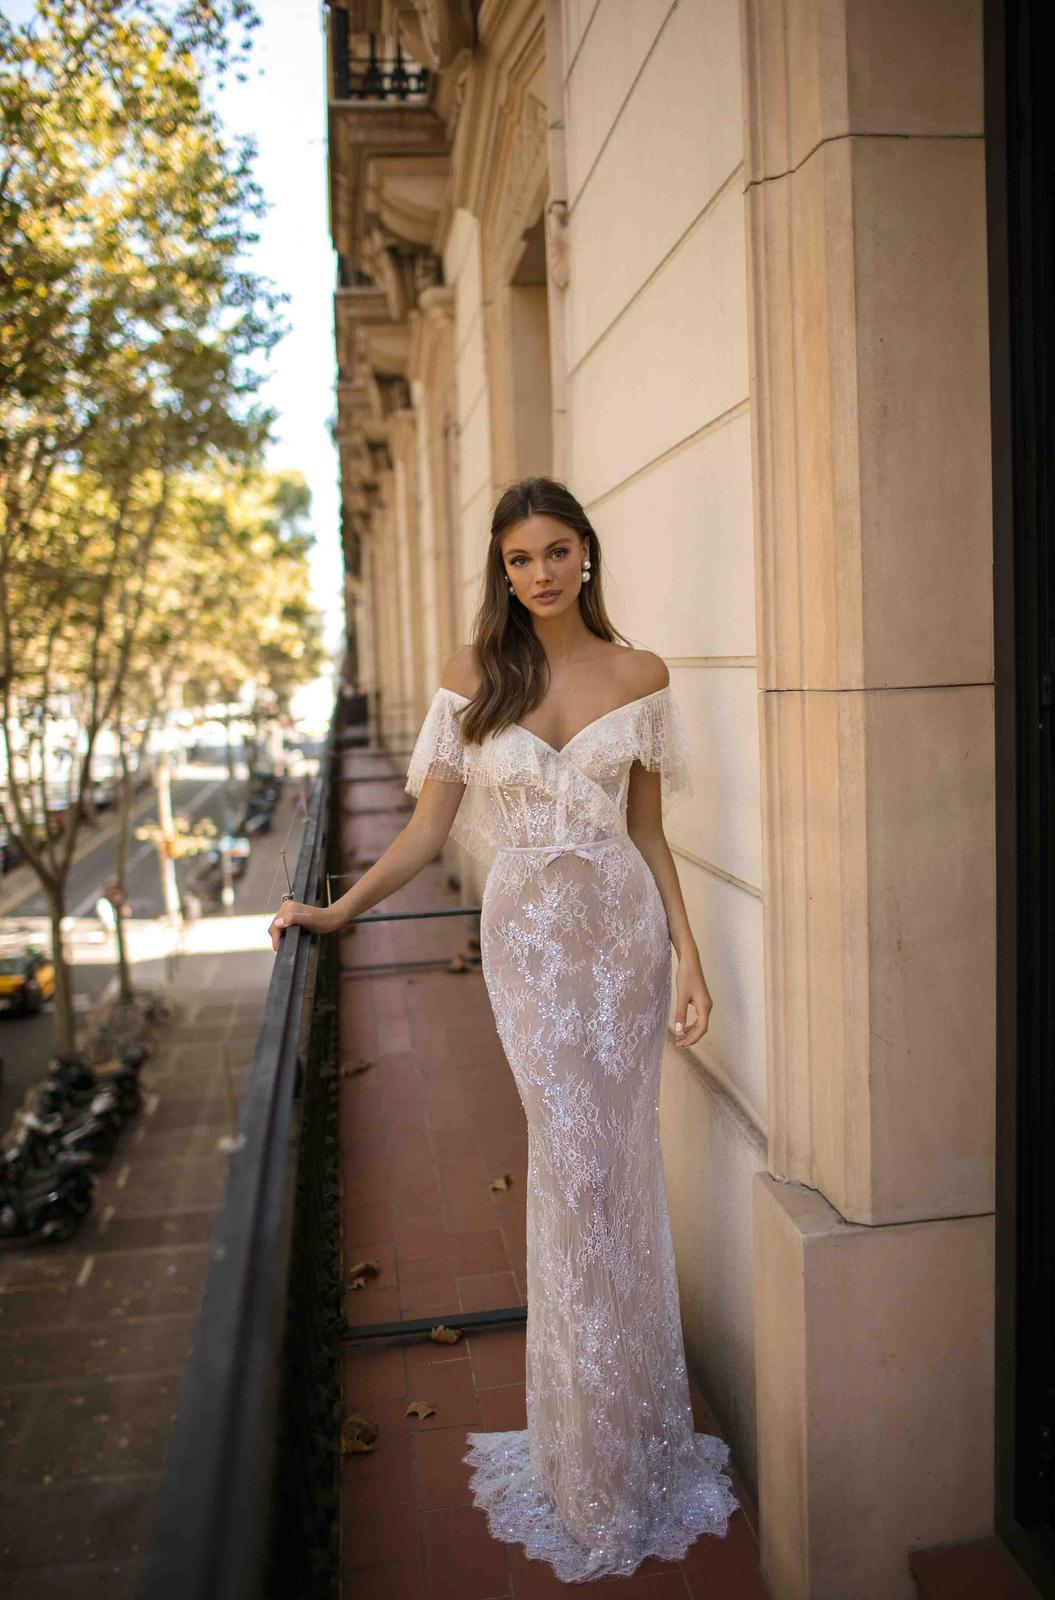 Muse by Berta * Svadobné šaty z kolekcií na rok 2019 - Obrázok č. 31